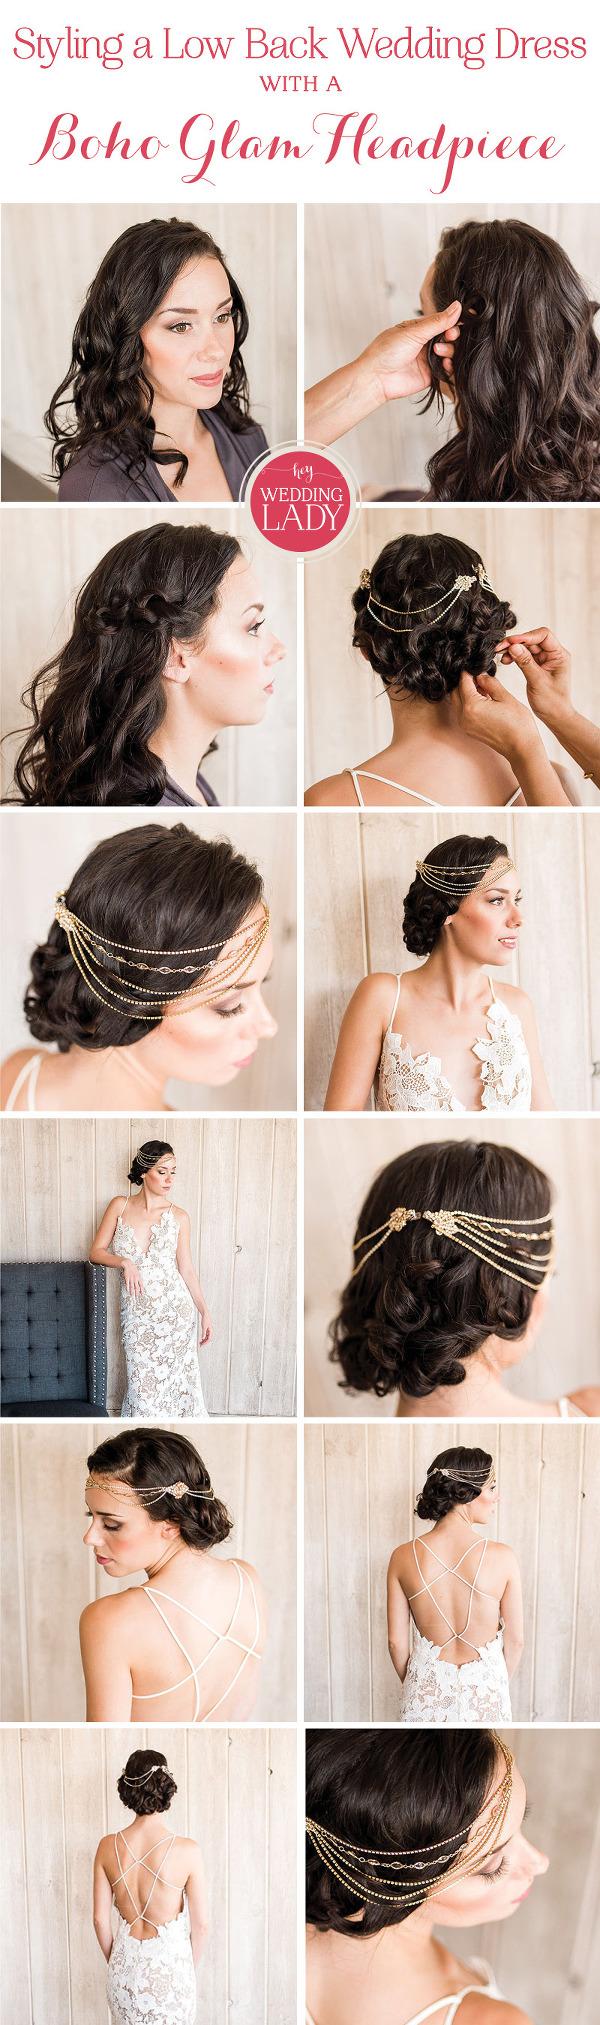 Styling a low back wedding dress with a boho glam headpiece